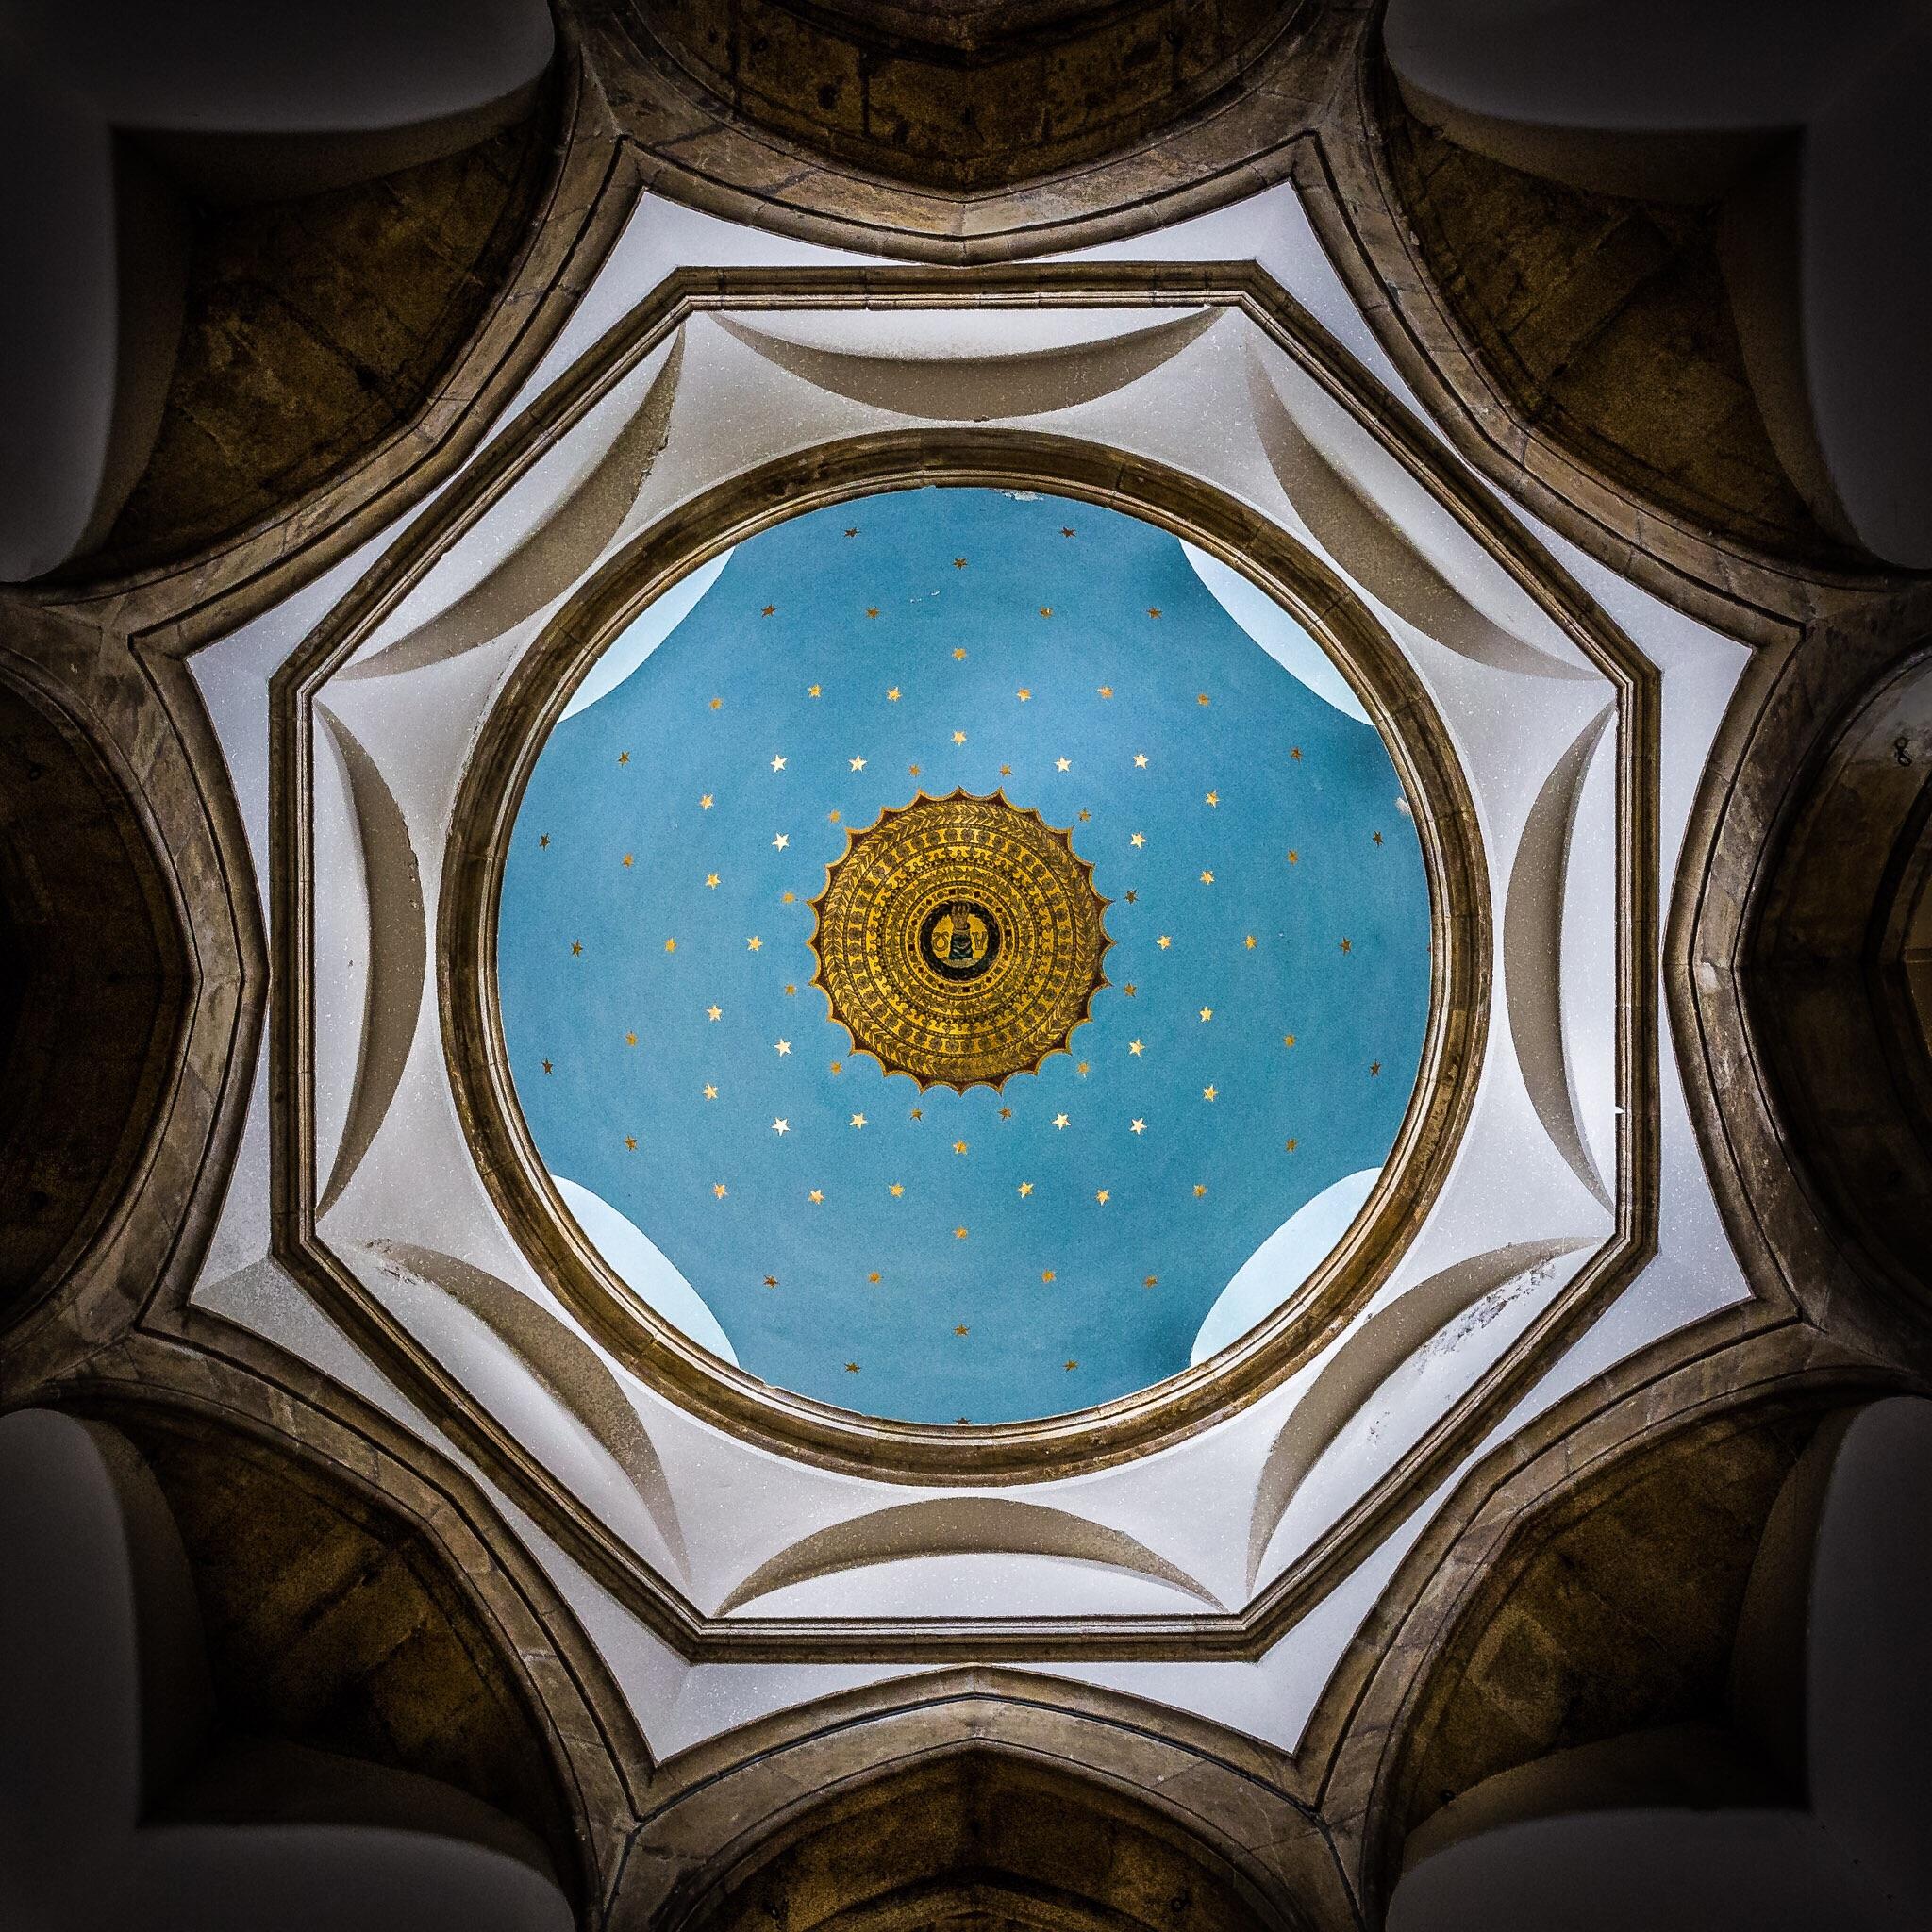 Chideock Church Dome, Dorset